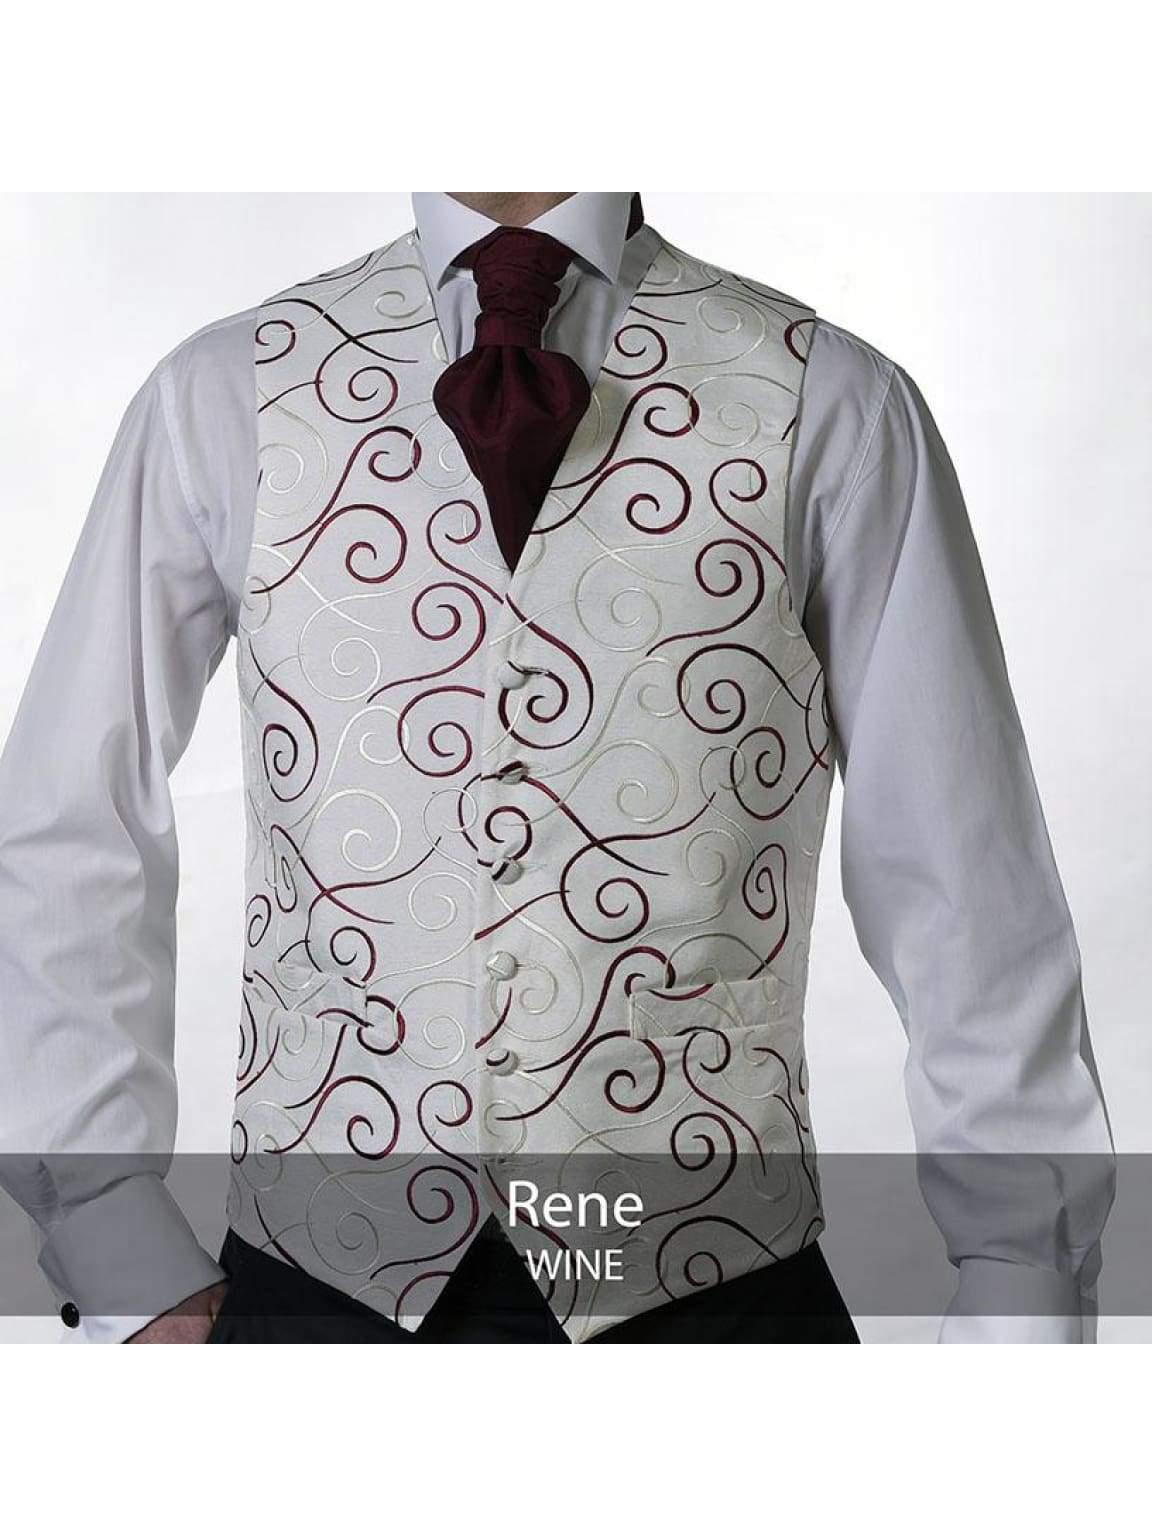 Heirloom Rene Mens Wine Luxury 100% Wool Tweed Waistcoat - 34R - WAISTCOATS